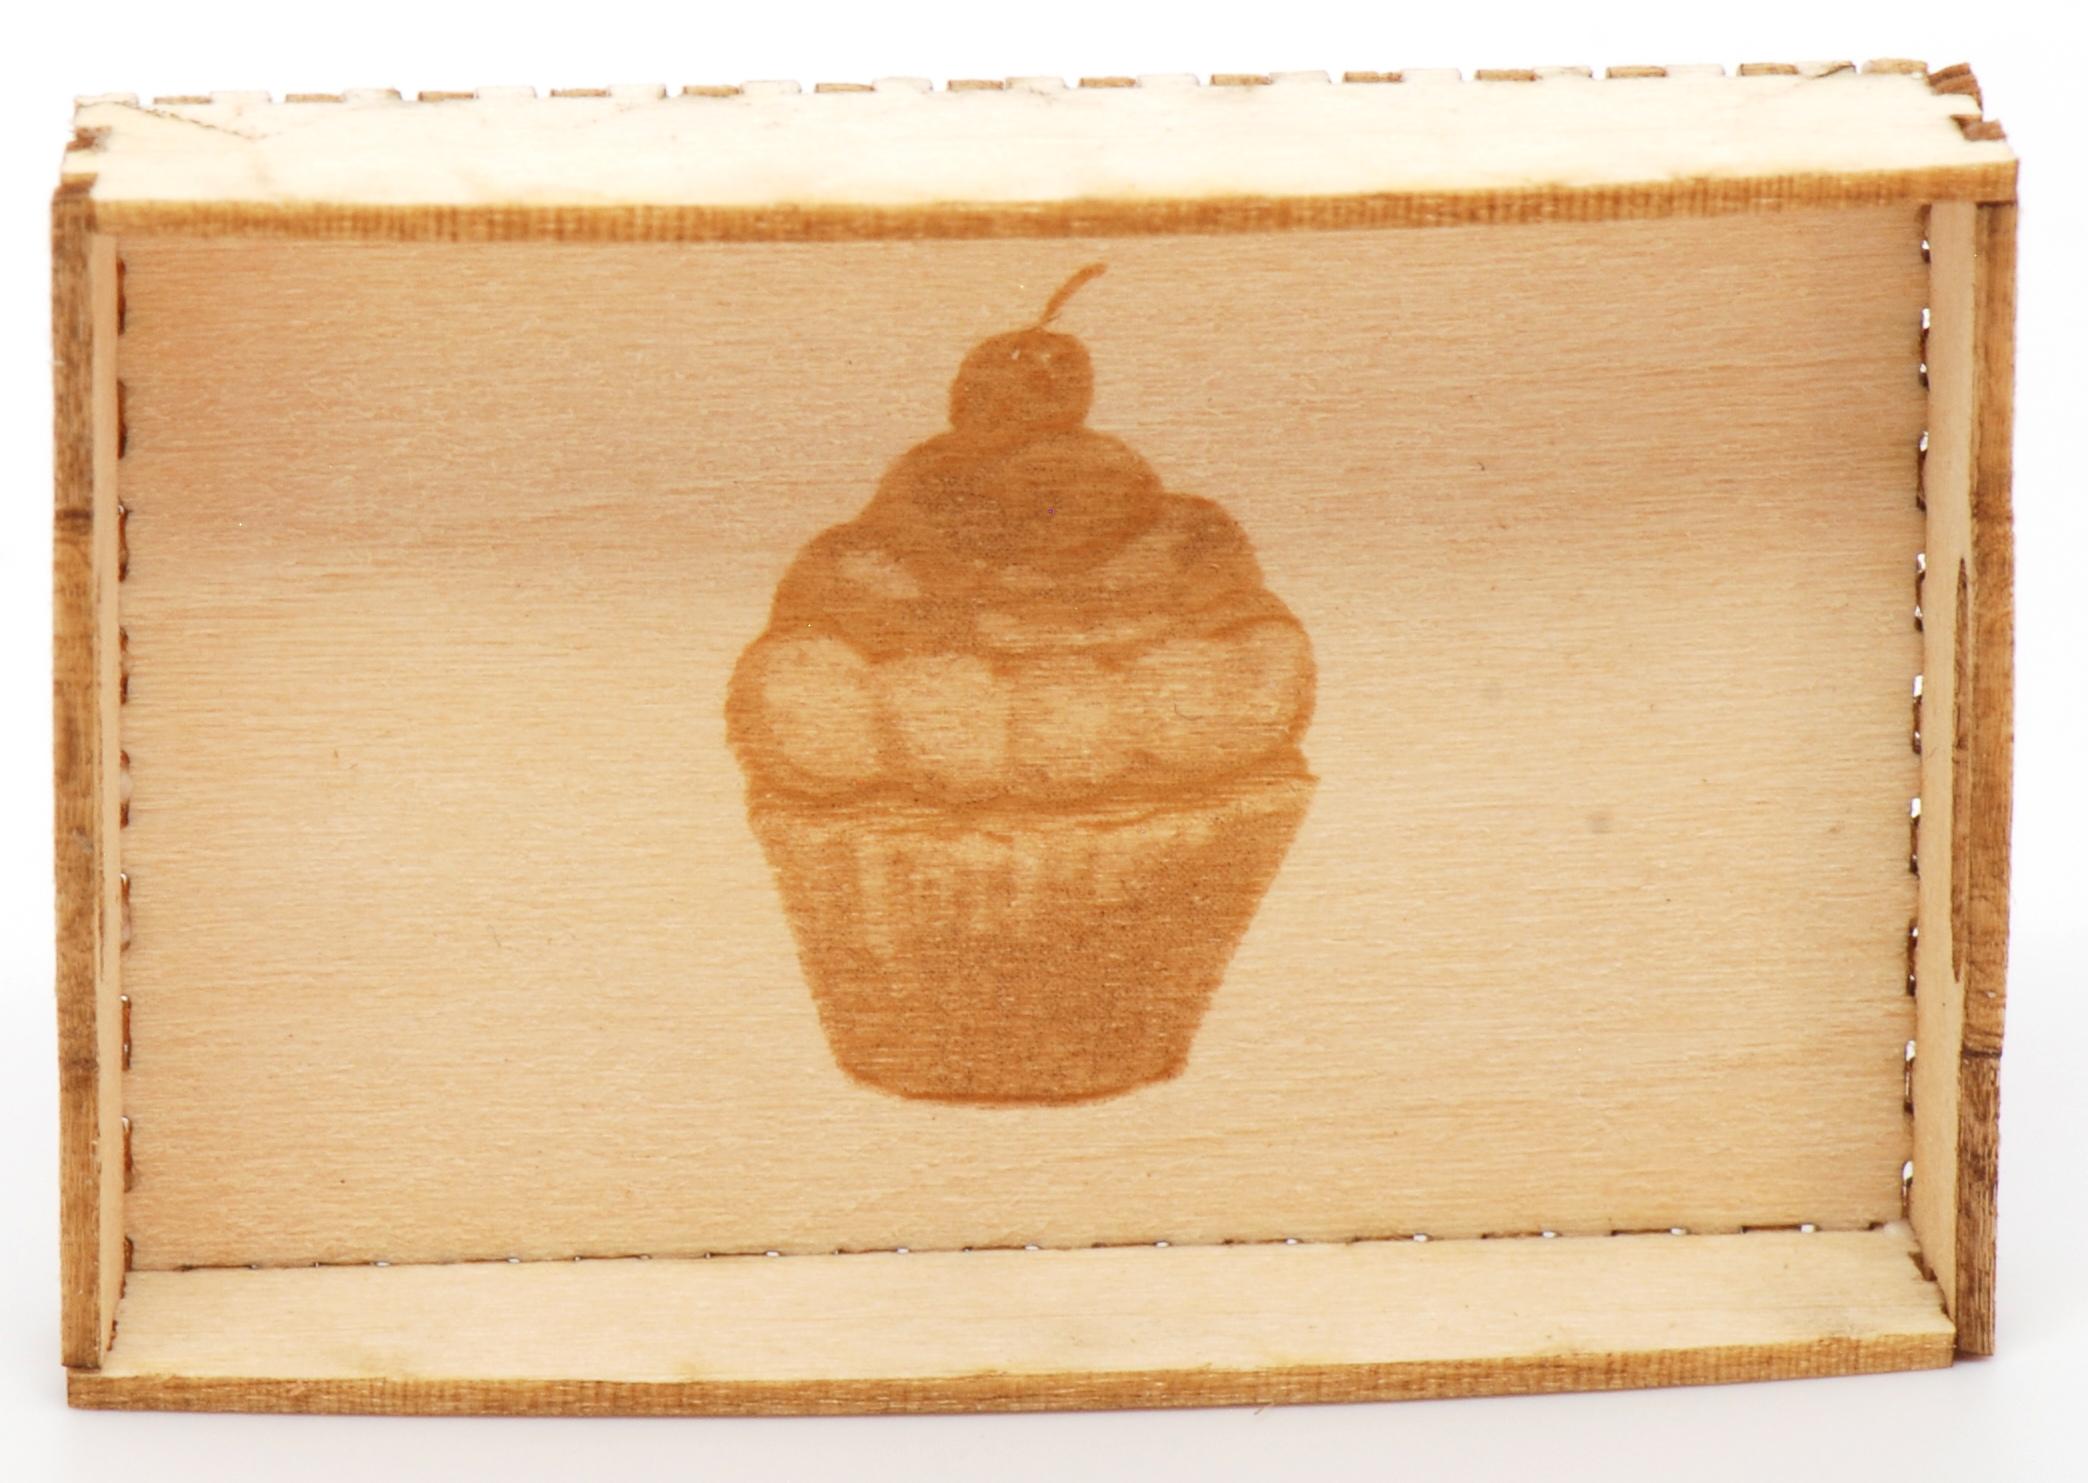 12 Cupcake Tea Tray Kit | Stewart Dollhouse Creations